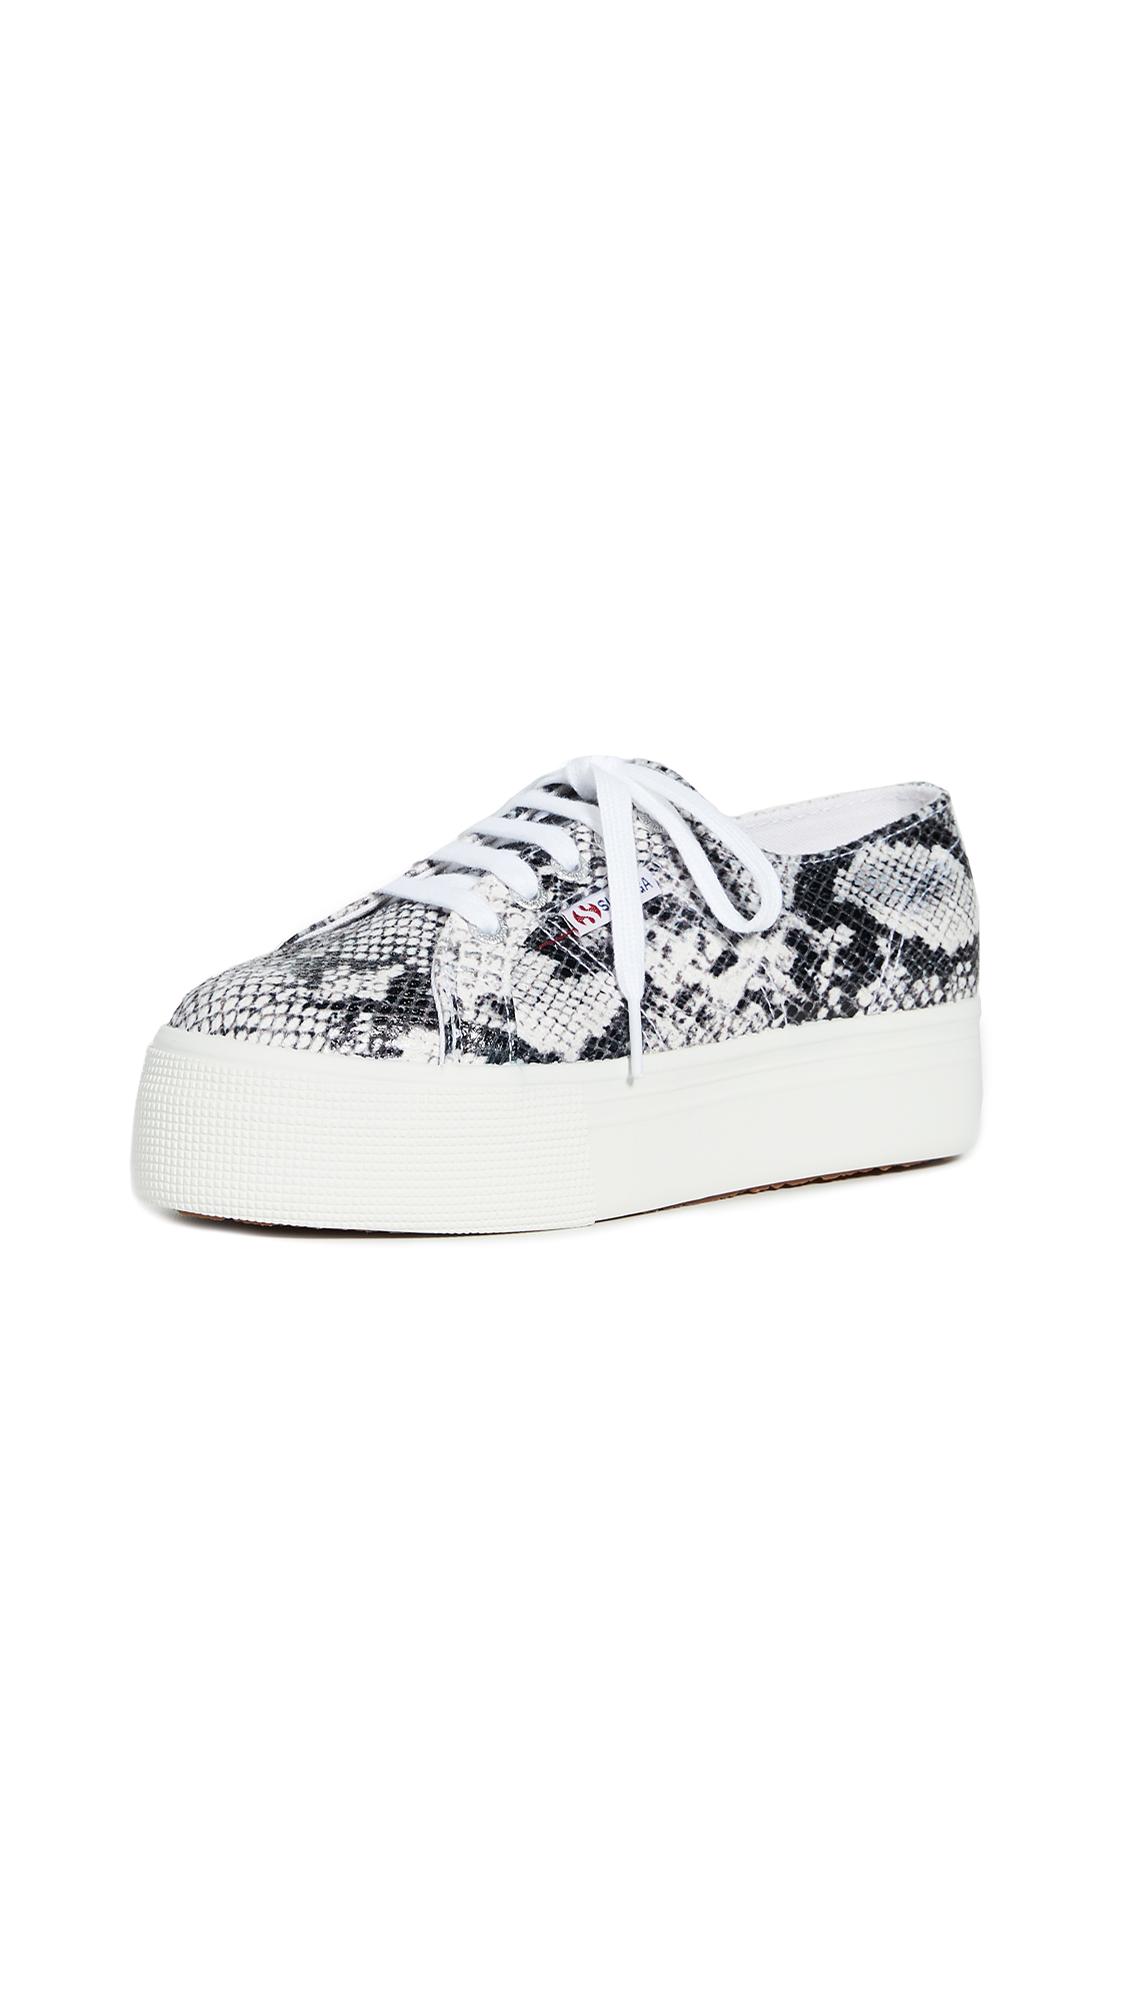 Superga 2790 Animal Platform Sneakers - 30% Off Sale